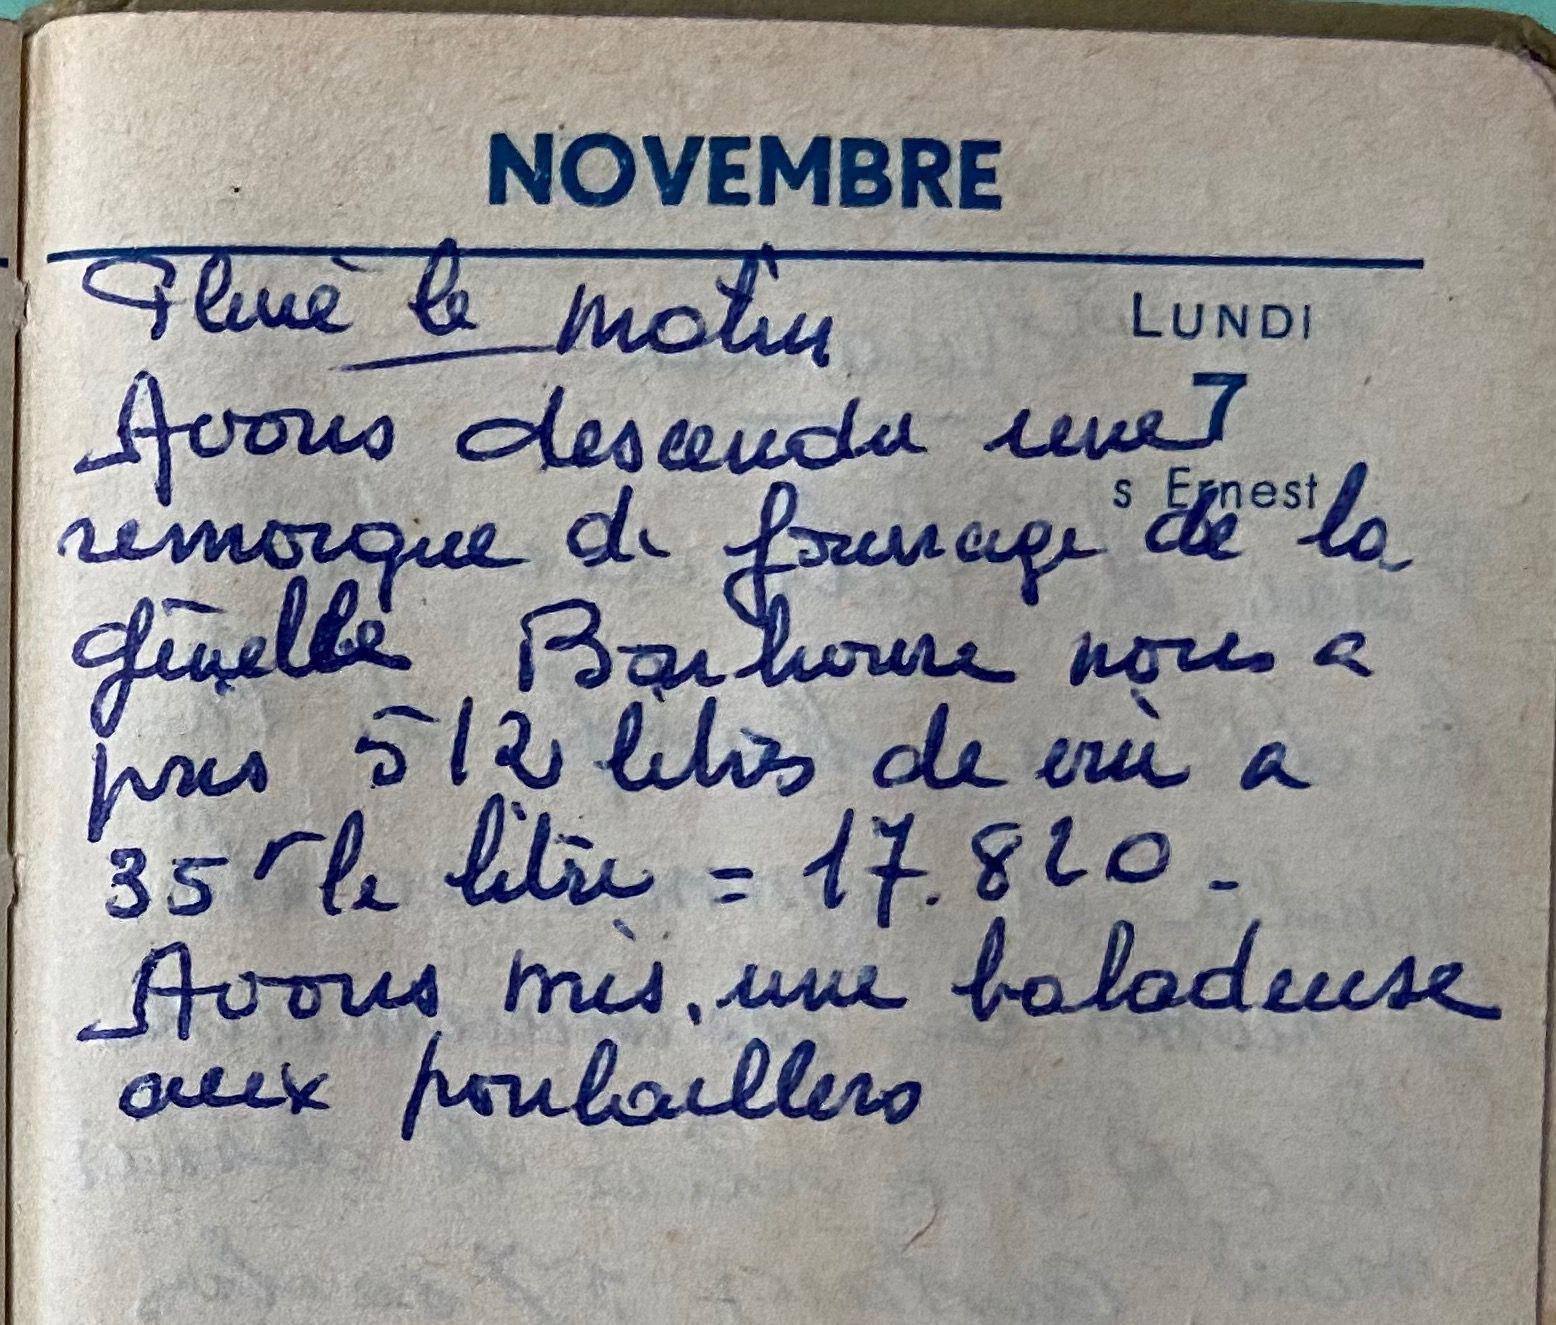 Lundi 7 novembre 1960 - la charrette de fourrage et le vin